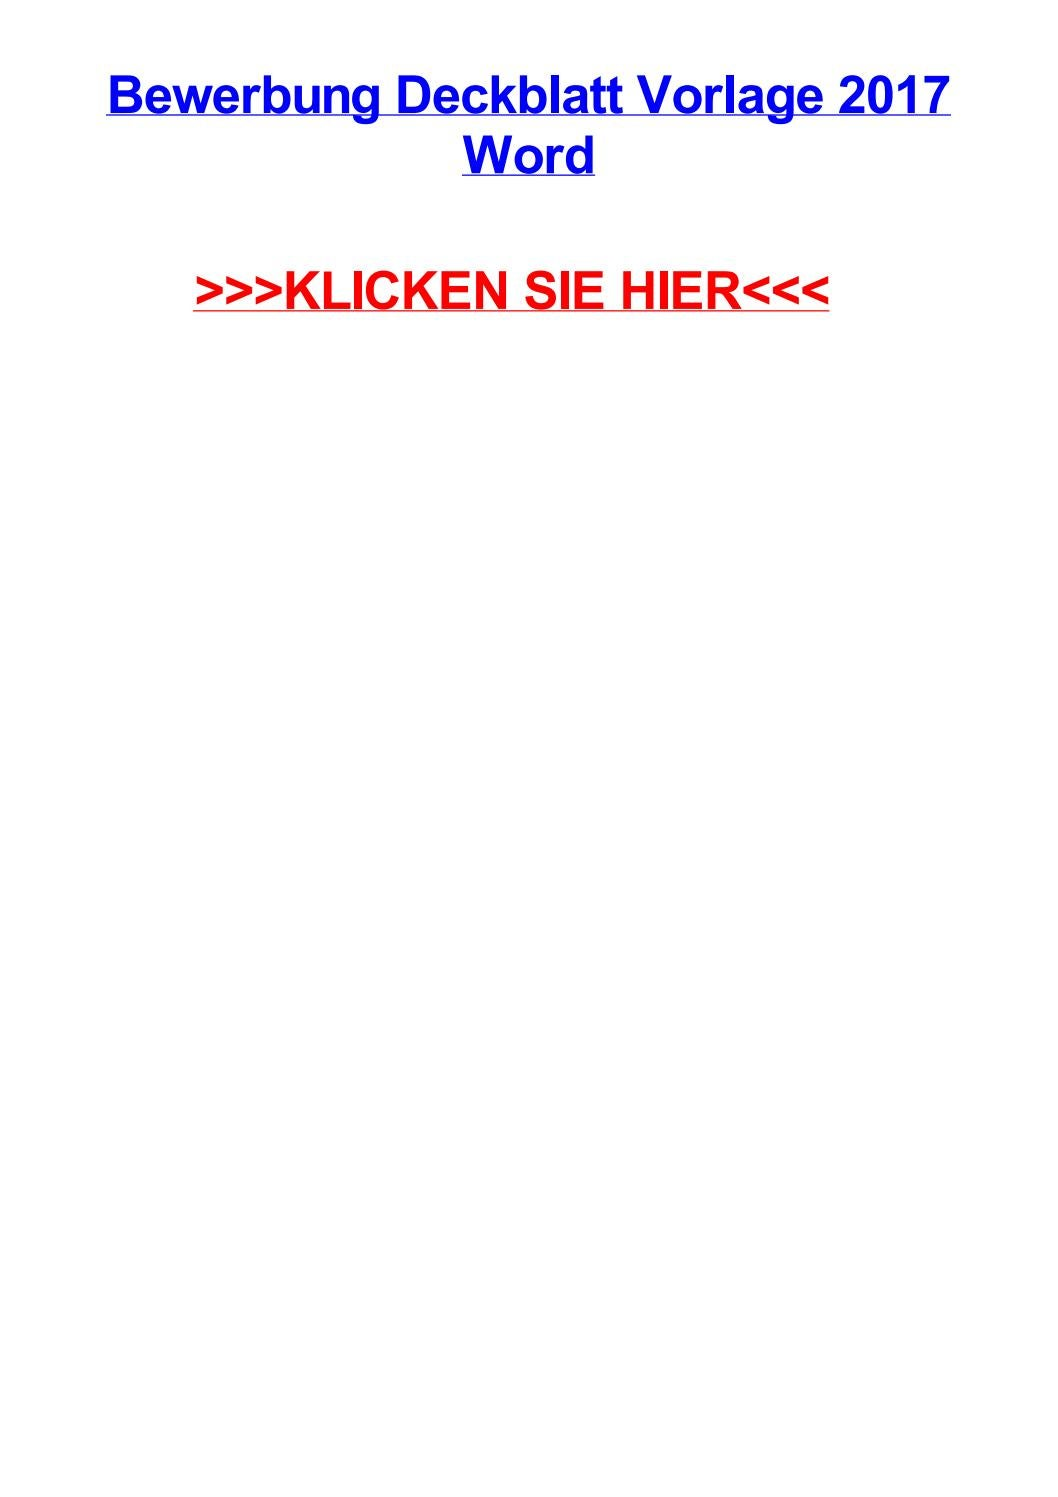 Bewerbung deckblatt vorlage 2017 word by lindsayfamw - issuu